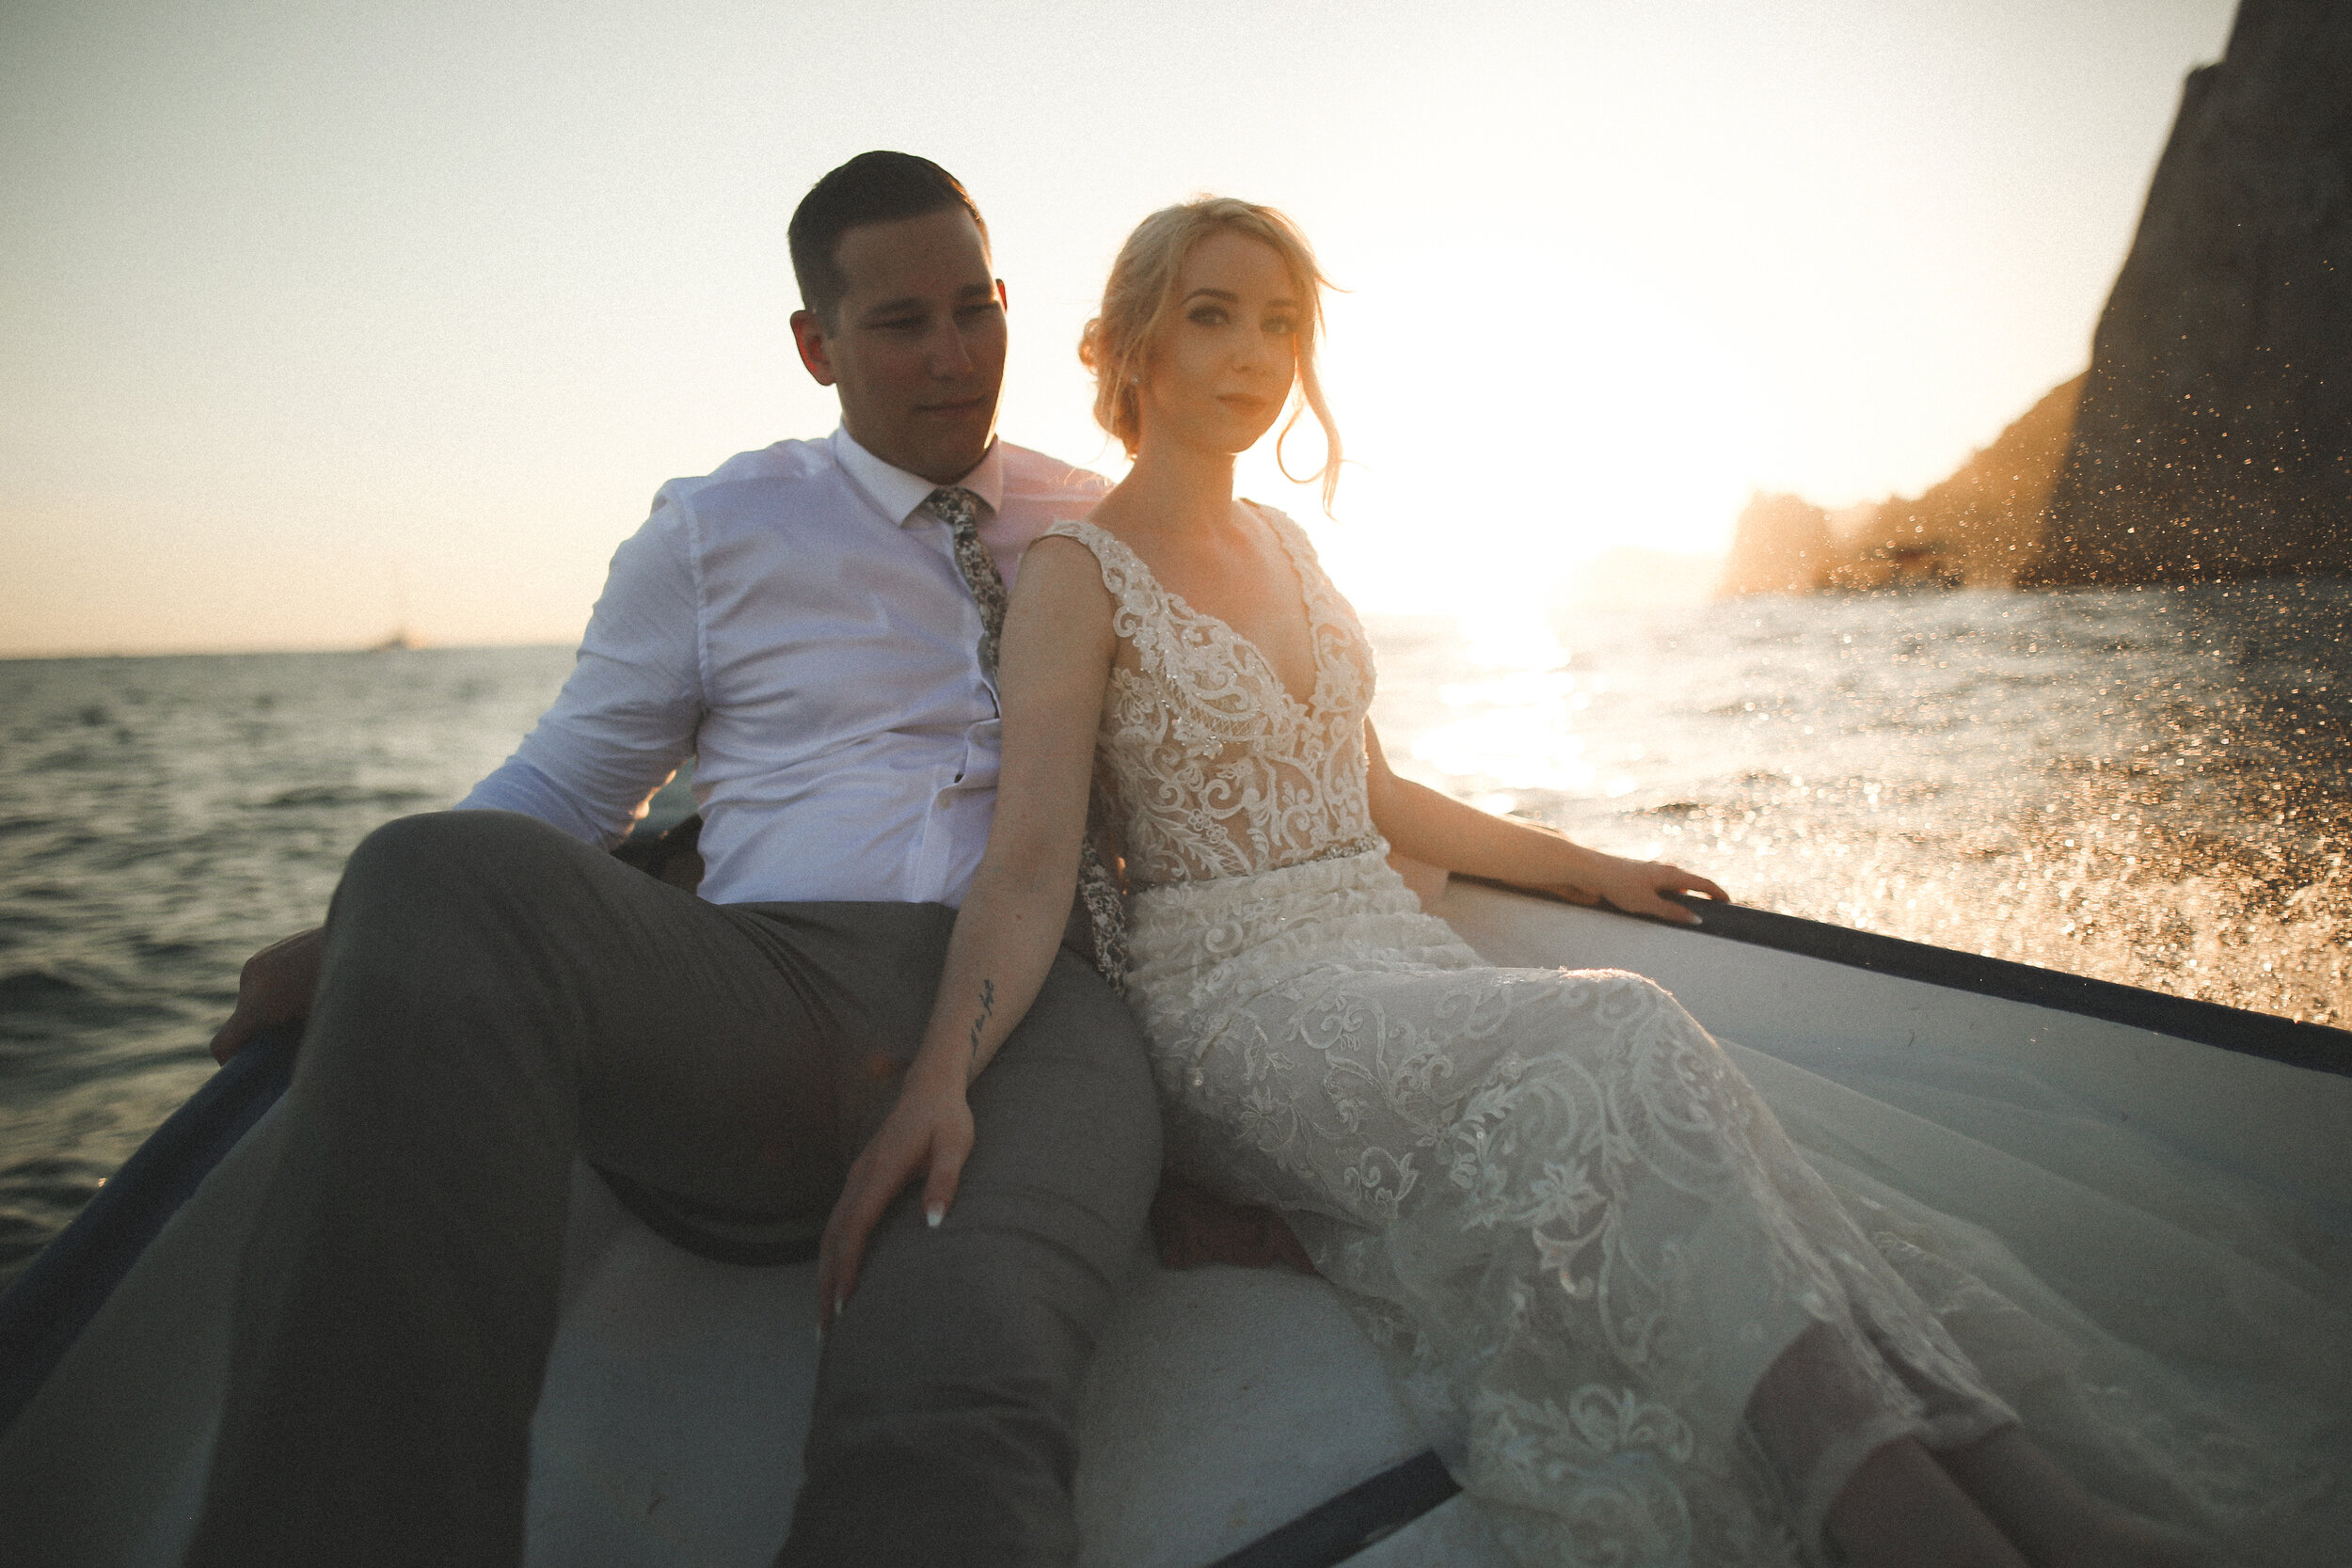 260-Adam-Ziorio-Photography-VictoriaBC-Weddings&Elopements.jpg